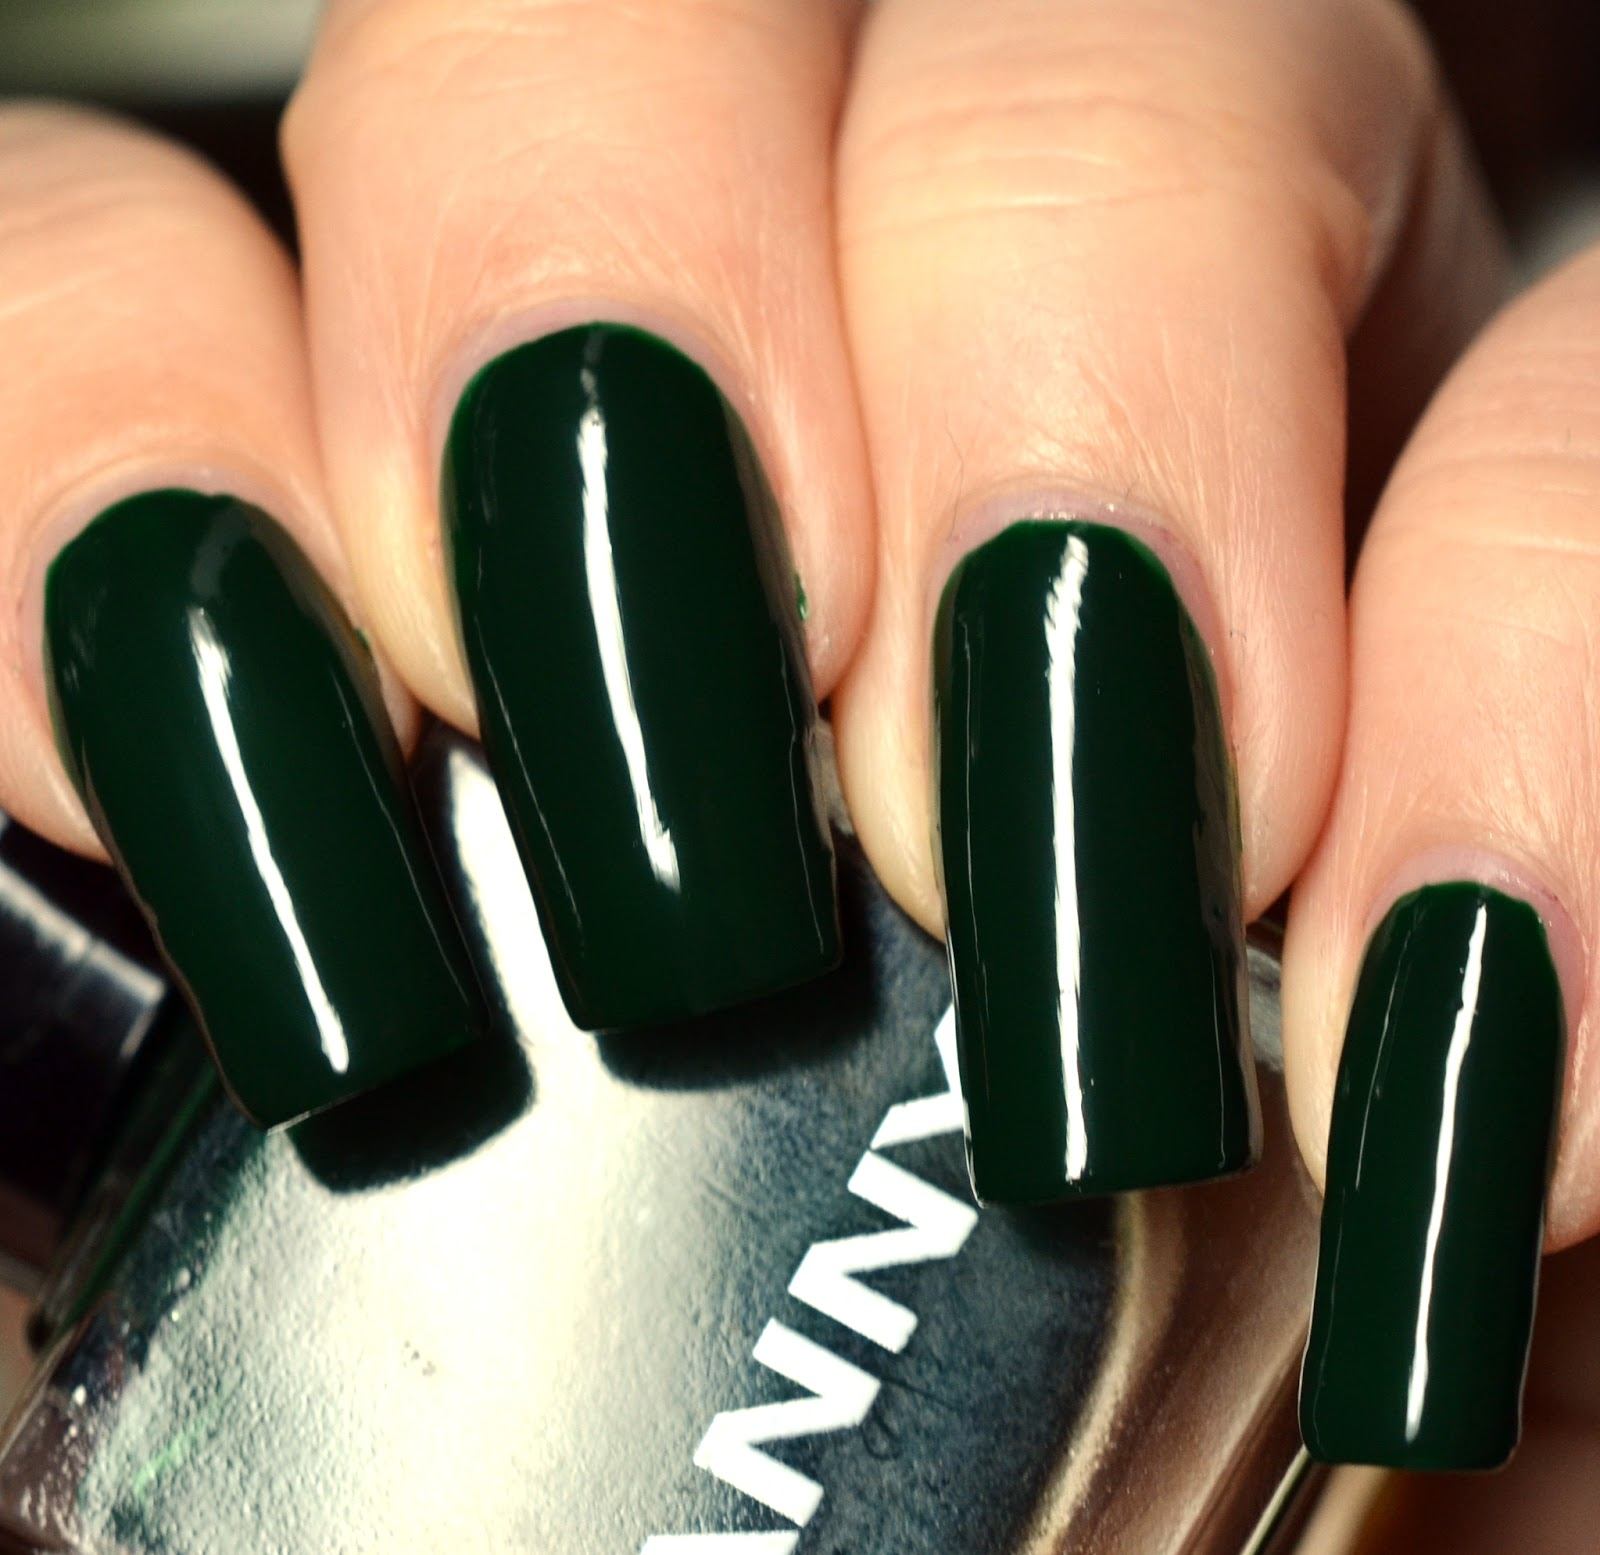 Fabulous Lenas Sofa: Anny 369 Green racing drag TW85